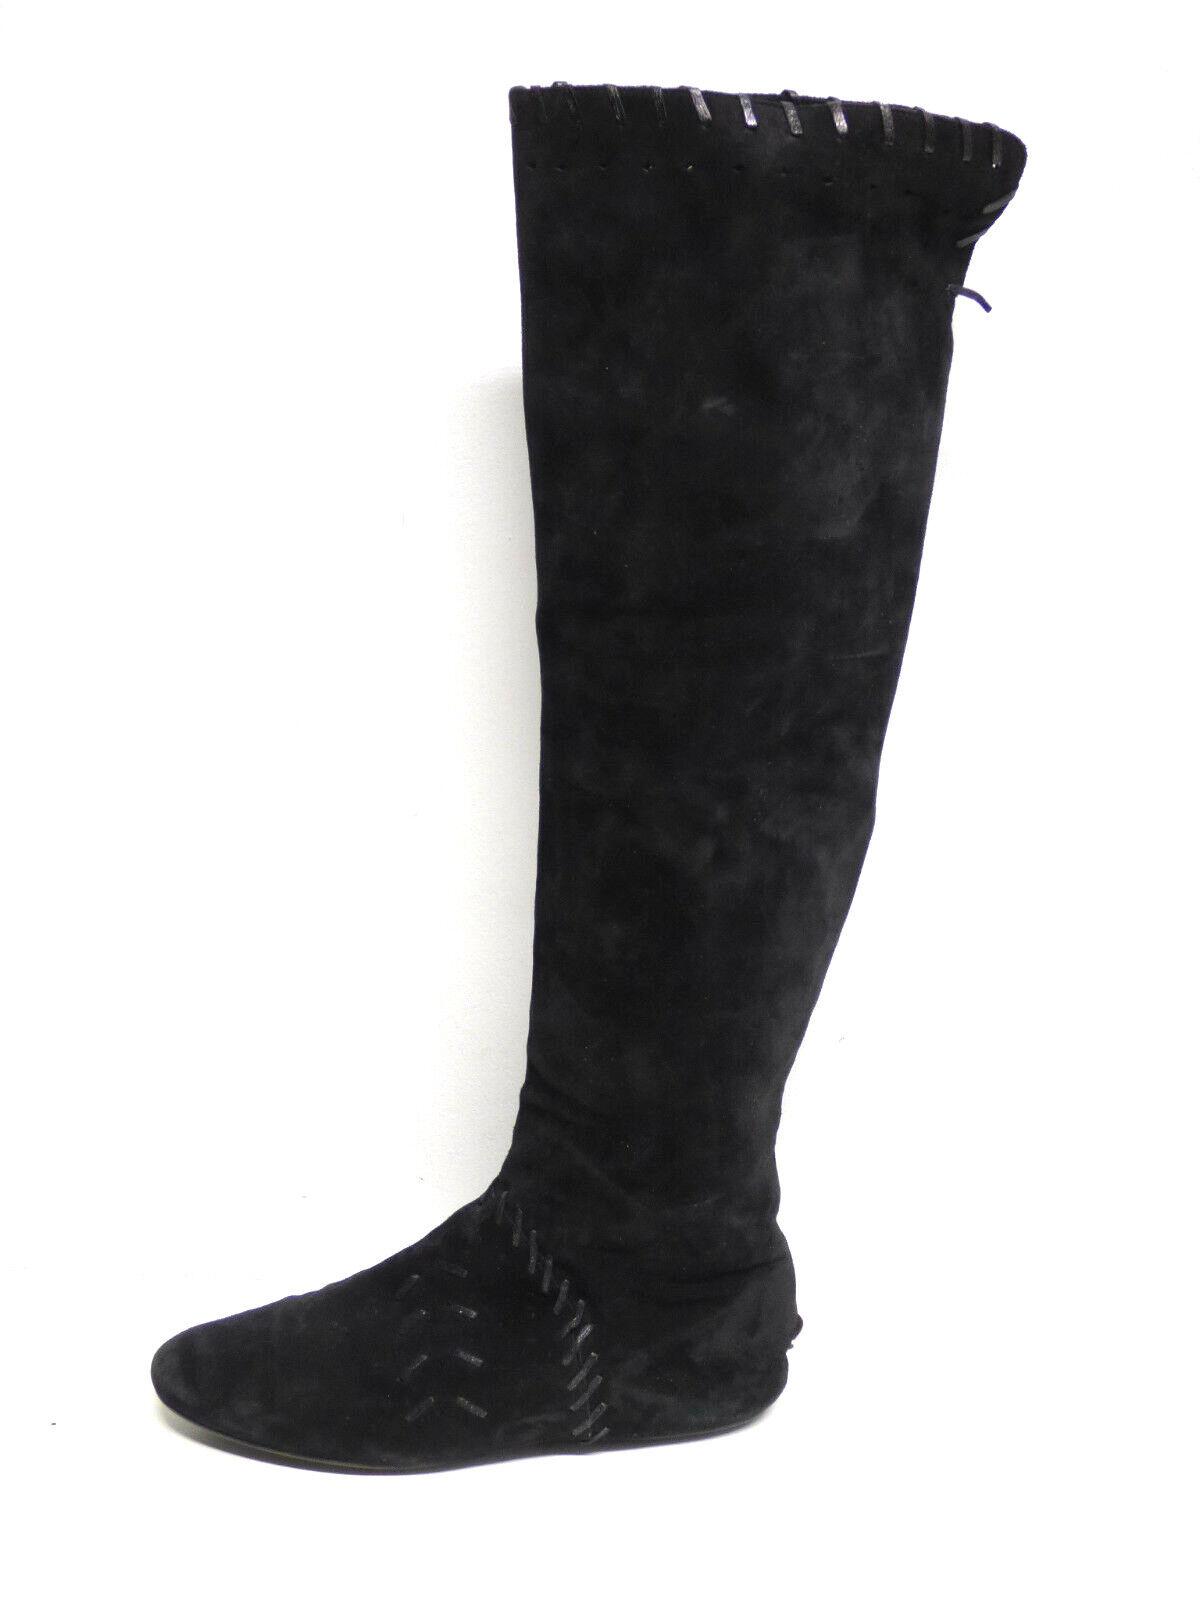 Jimmy Choo Femmes Bottes en cuir T 38,5 NOIR & 100% véritable cuir (P 6288)